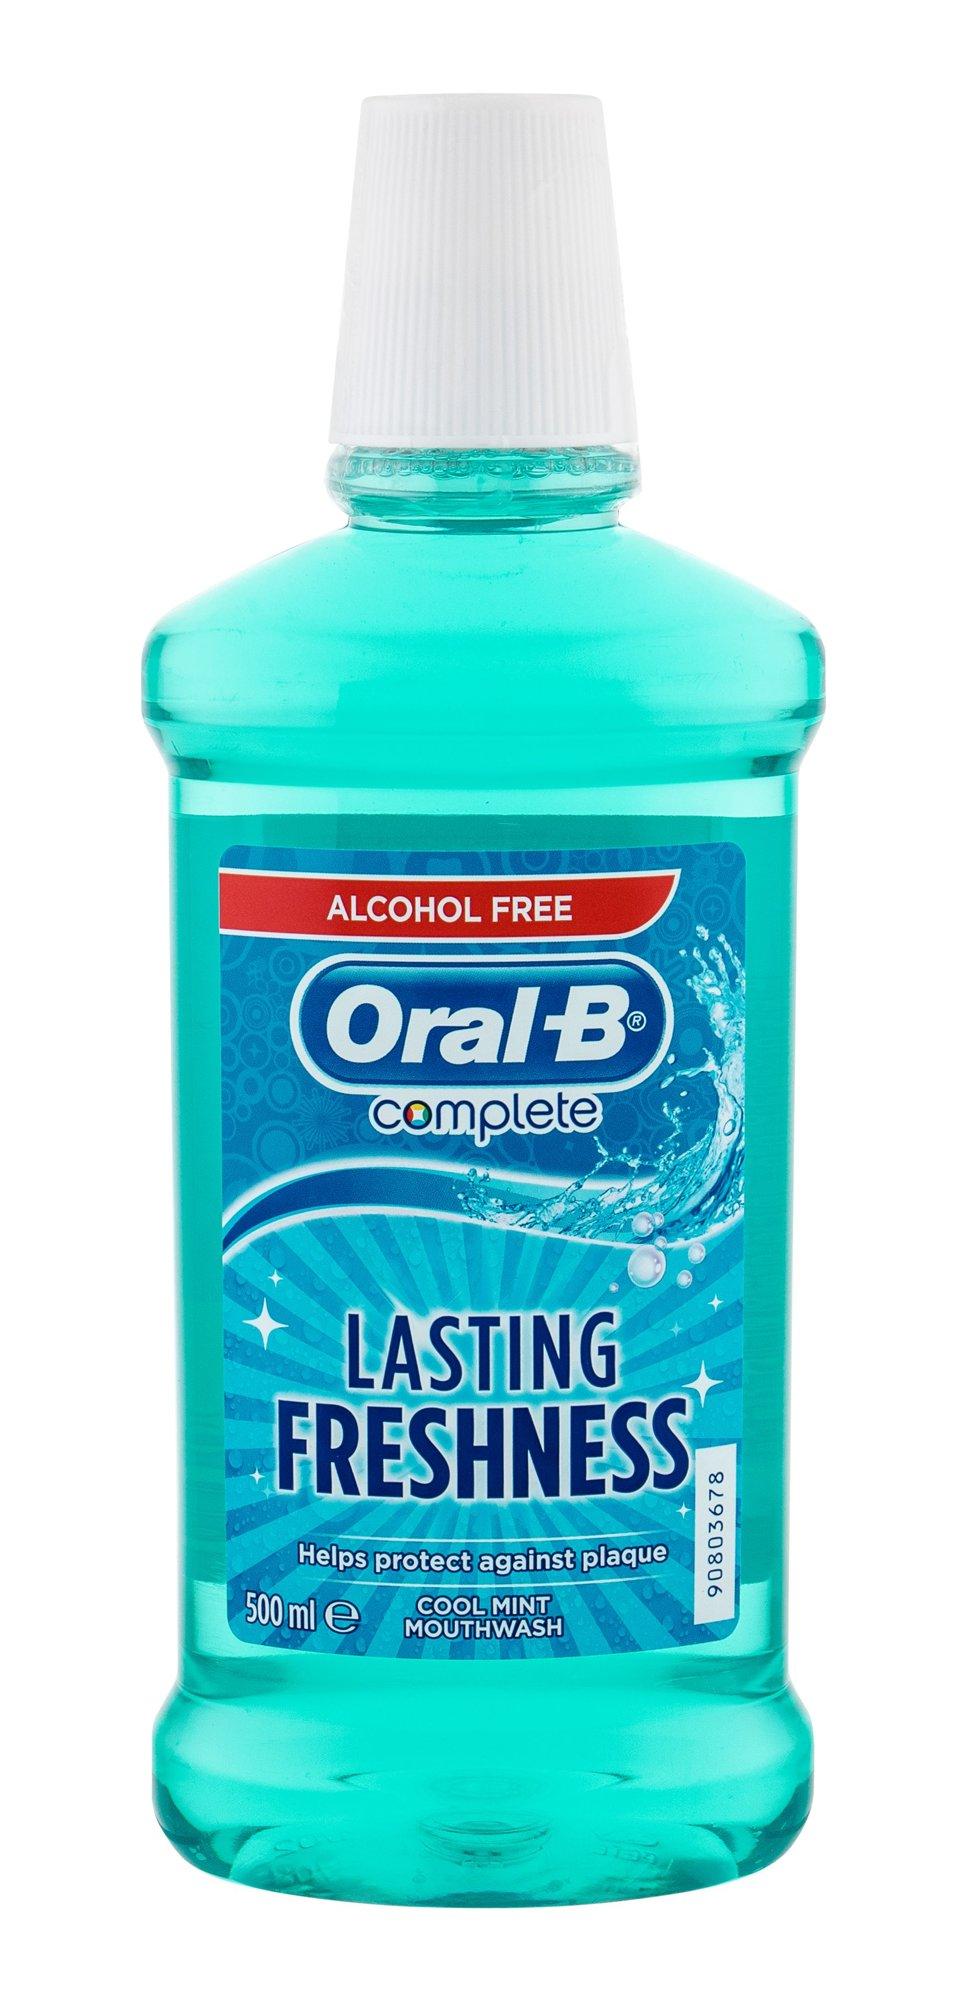 Oral-B Mouthwash Mouthwash 500ml  Complete